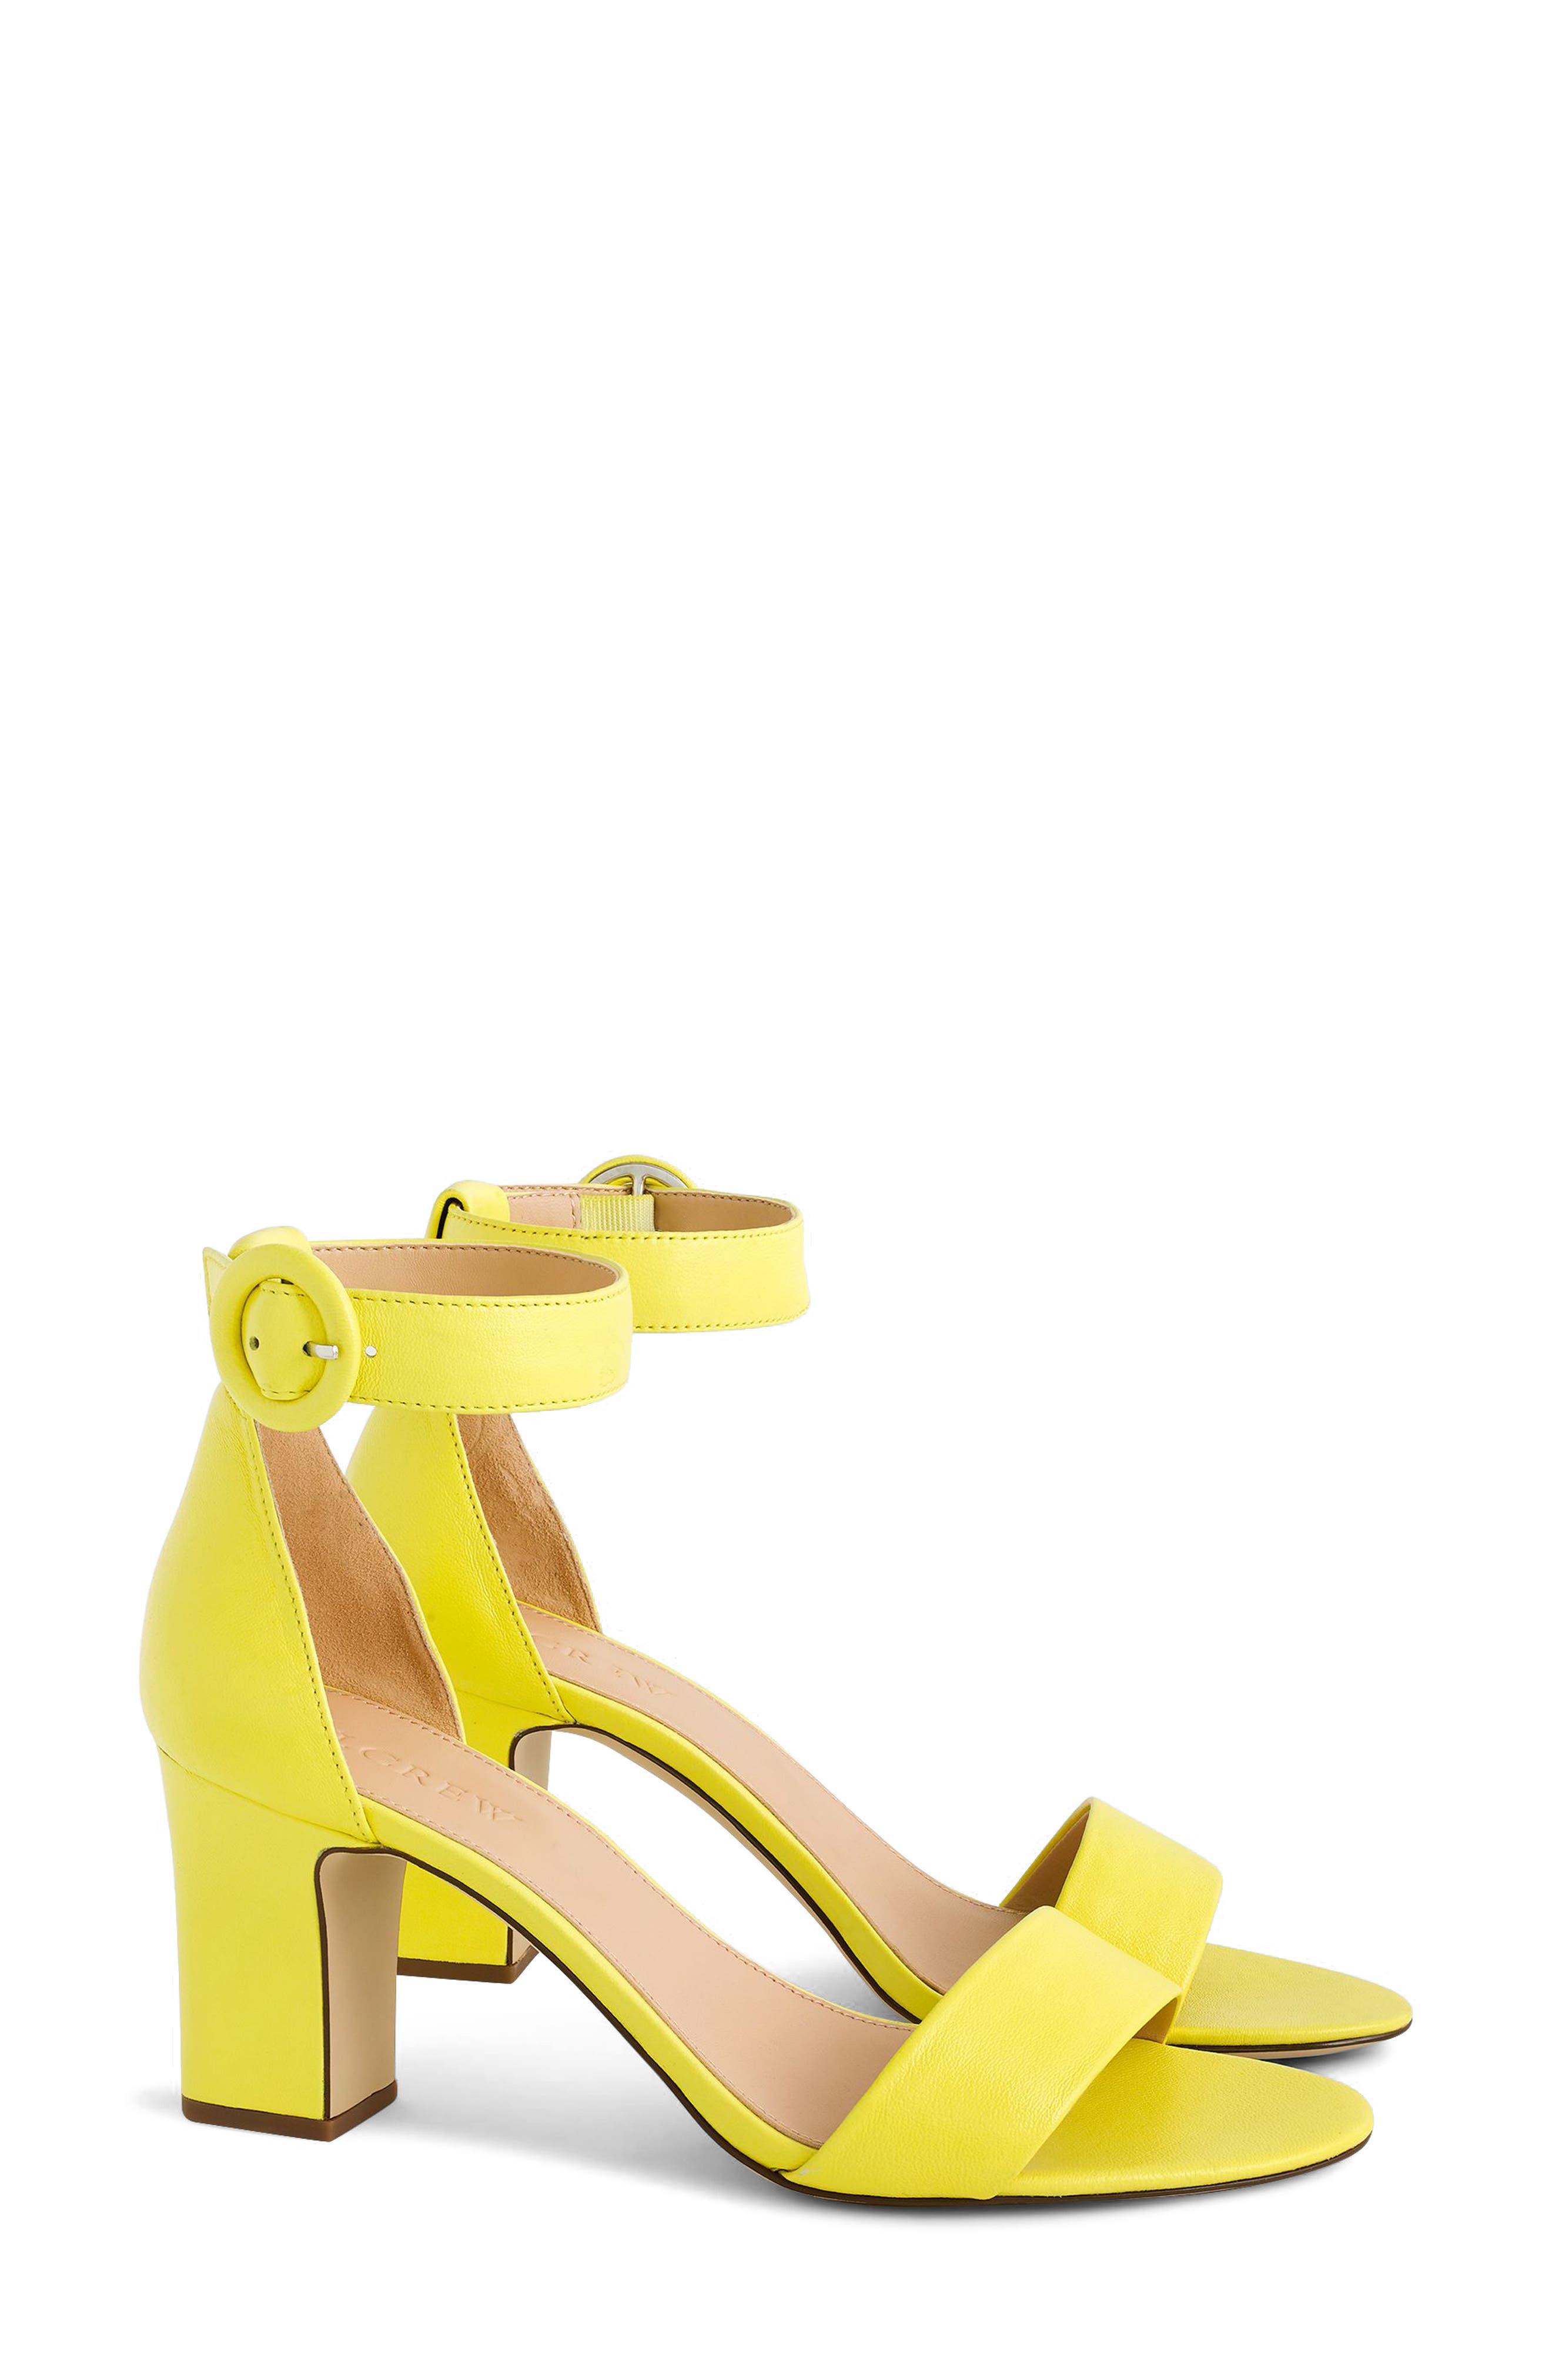 Remi Ankle Strap Sandal,                         Main,                         color, Lemon Sorbet